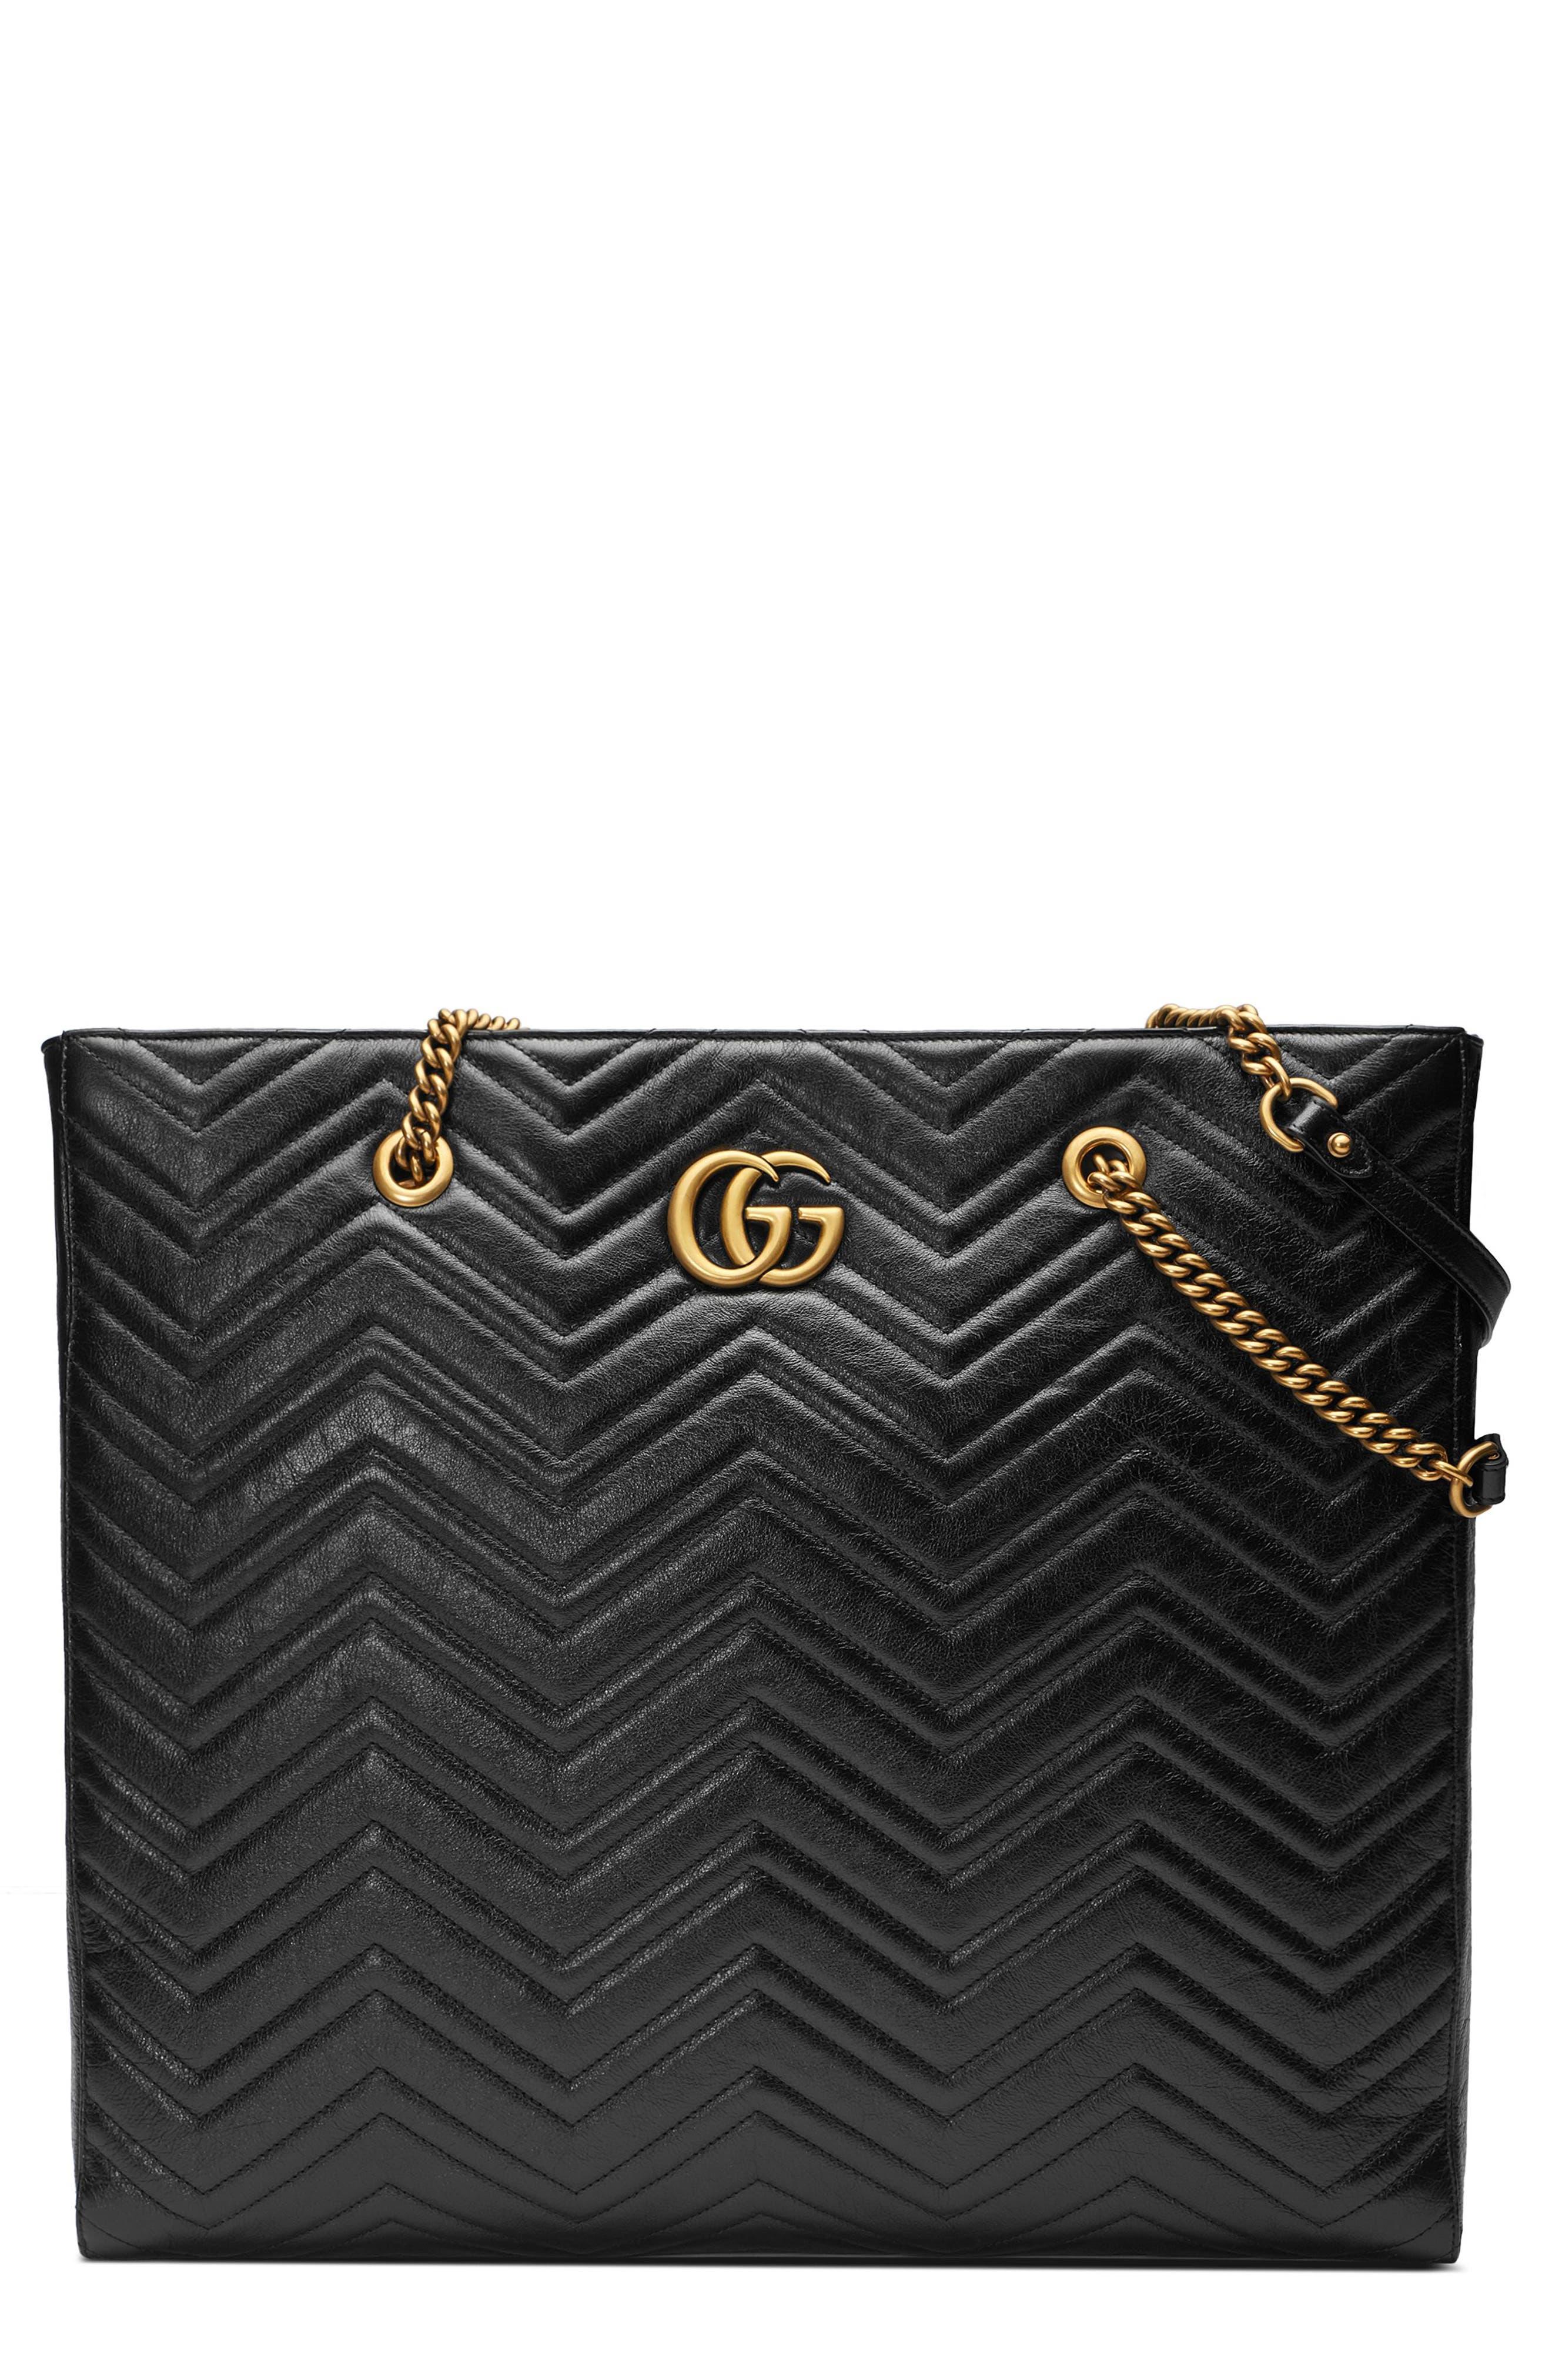 GG Marmont 2.0 Matelassé Leather North/South Tote Bag,                         Main,                         color, NERO/ NERO